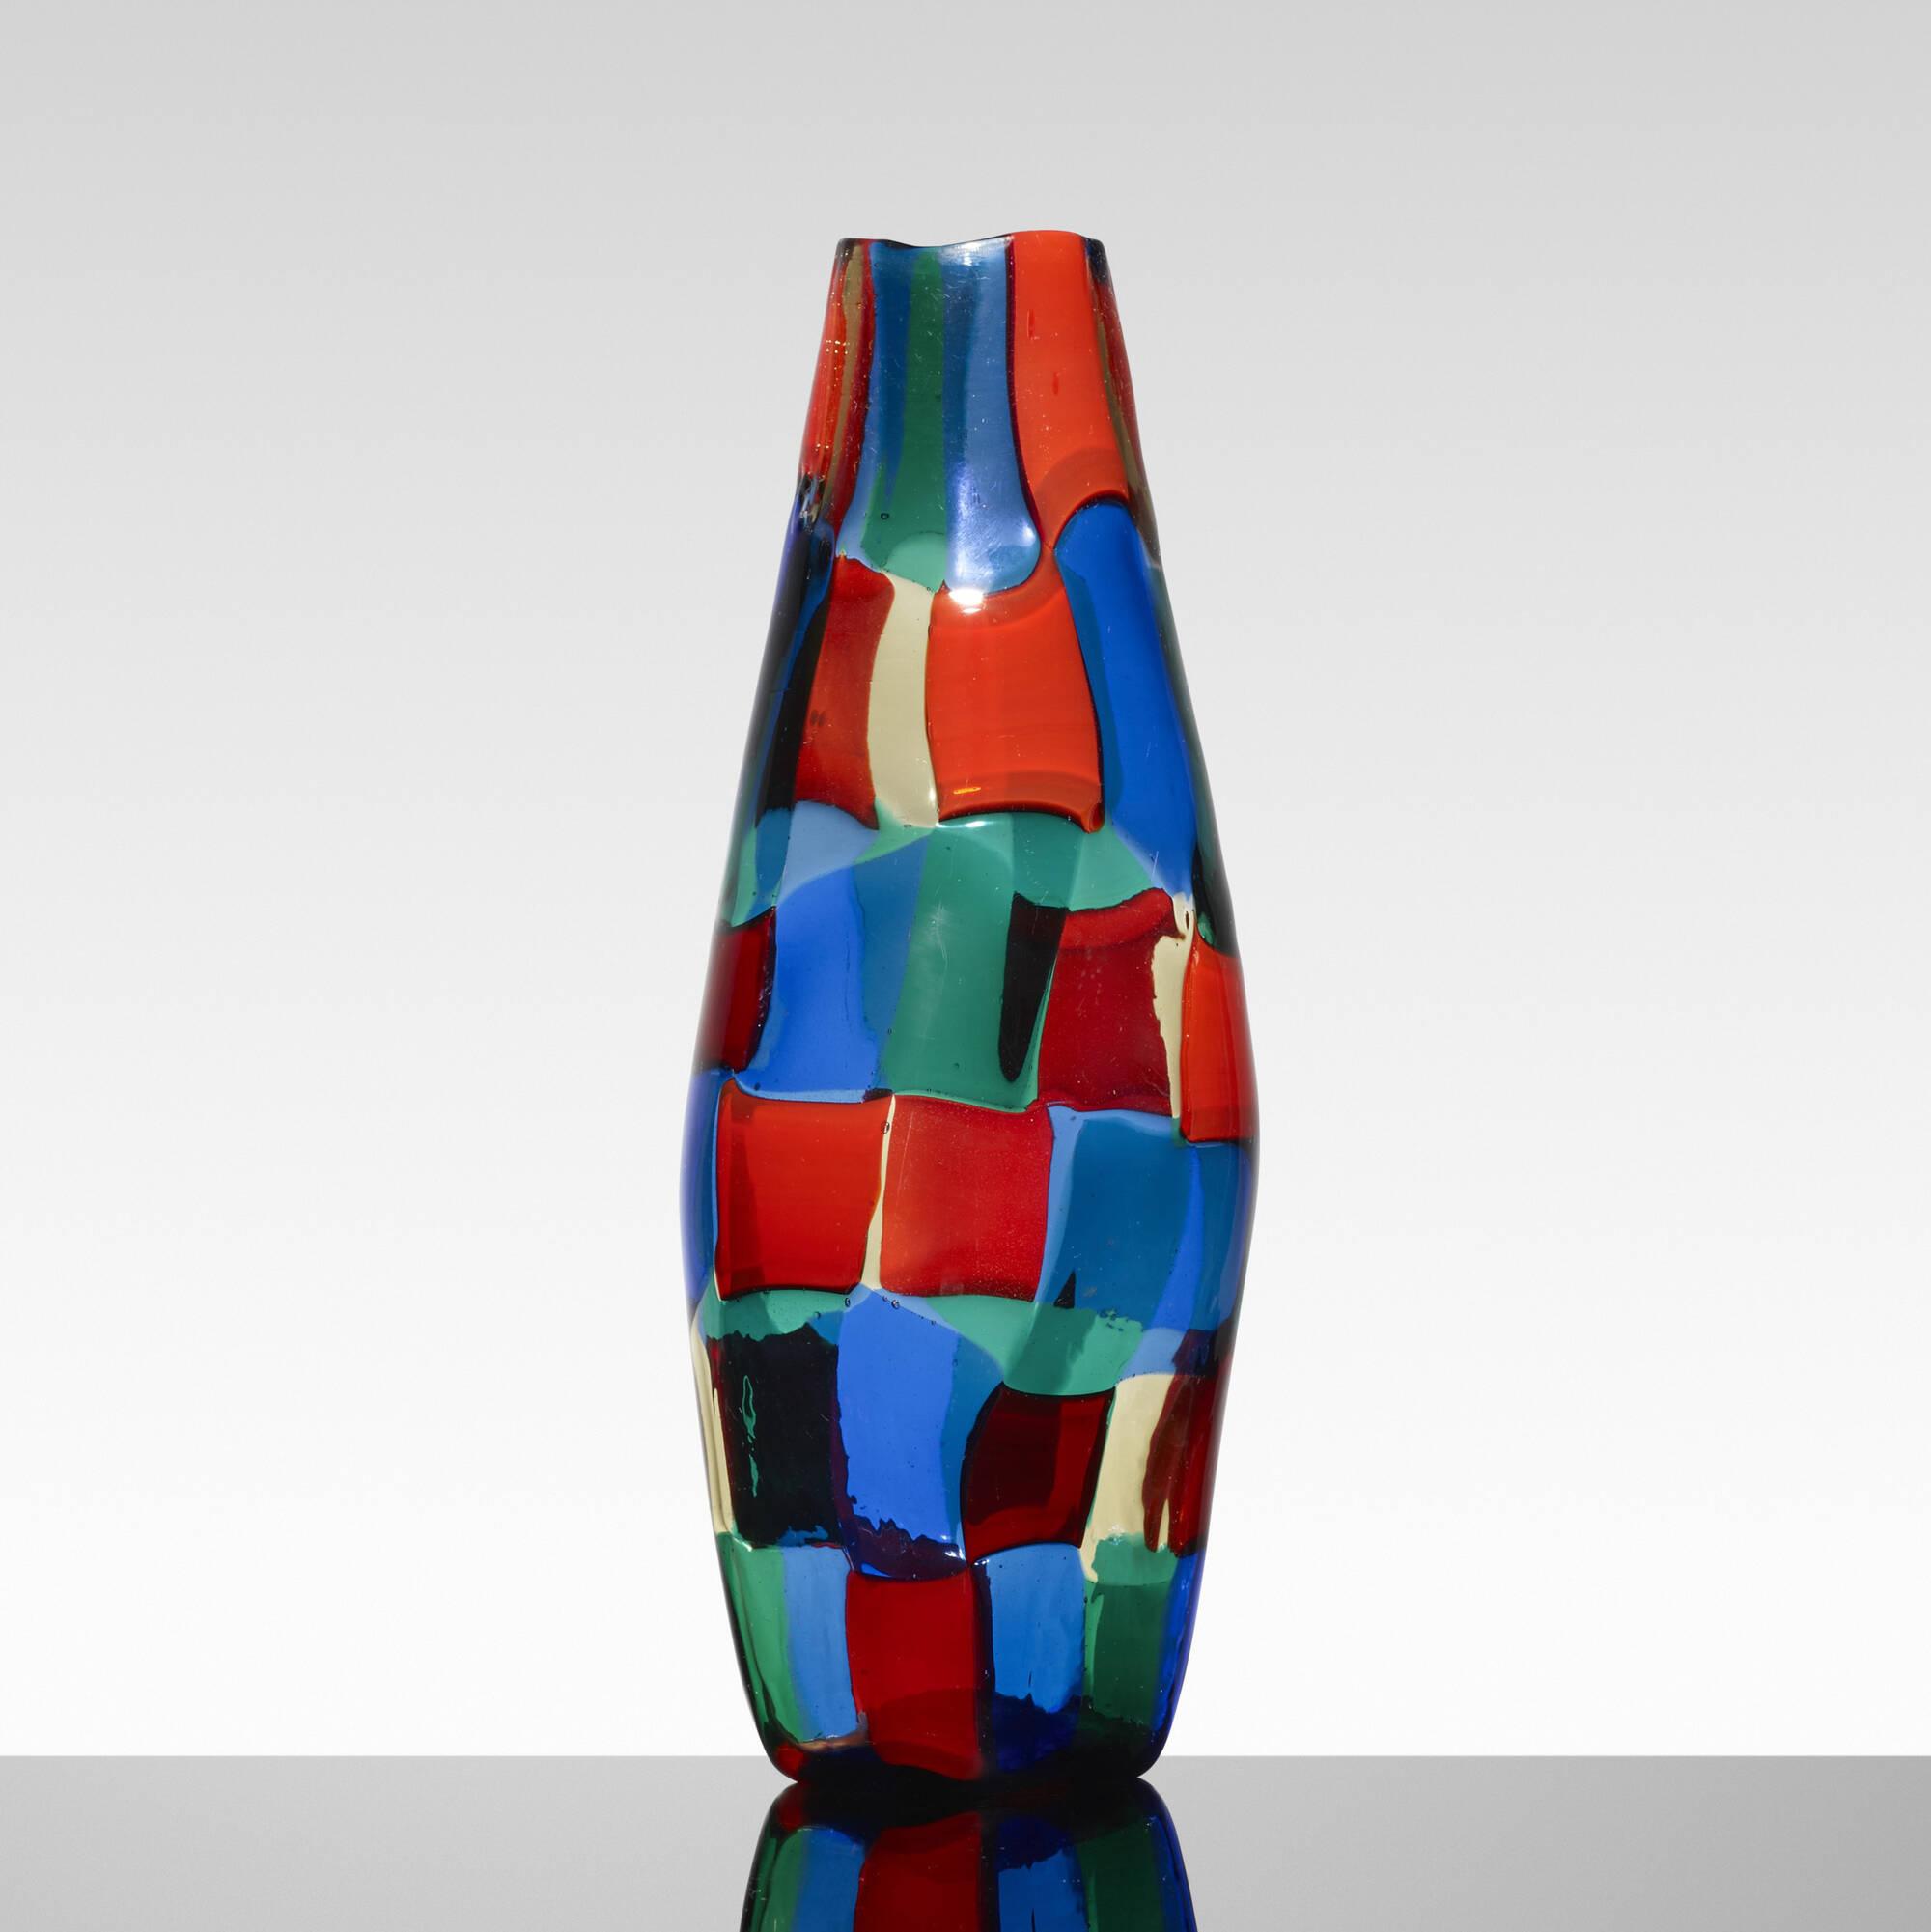 141: Fulvio Bianconi / Pezzato vase (2 of 4)